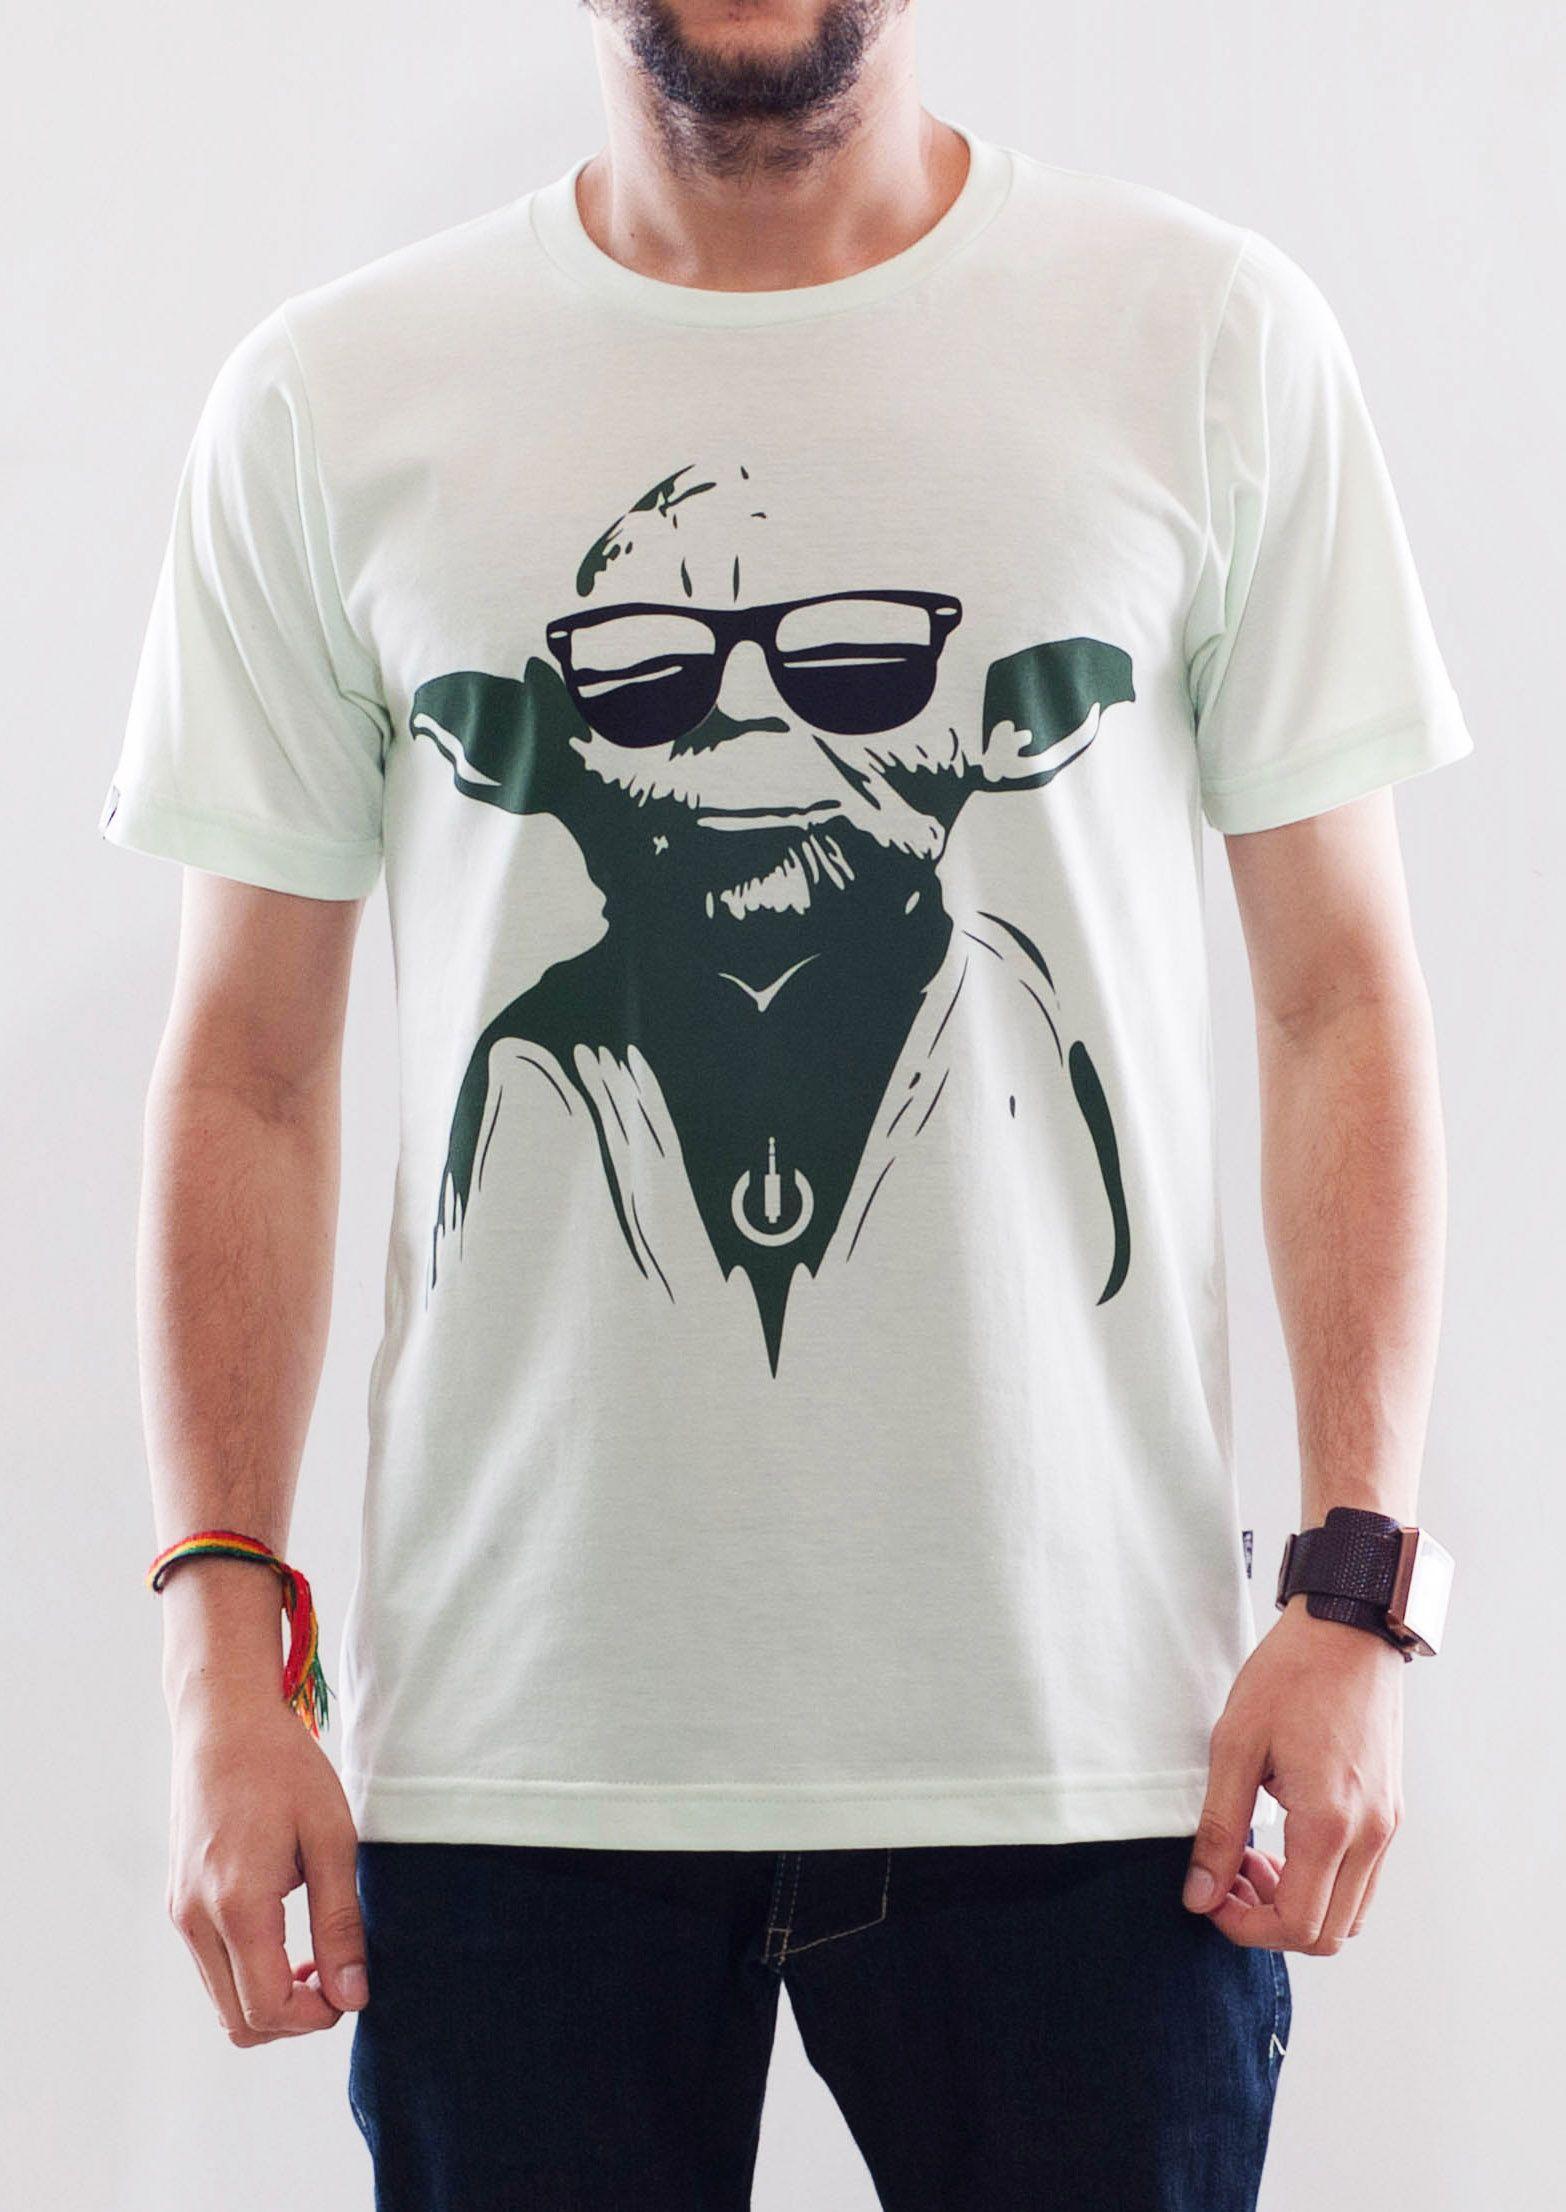 Camiseta Plugging Yoda, masculina e feminina, 100% algodão